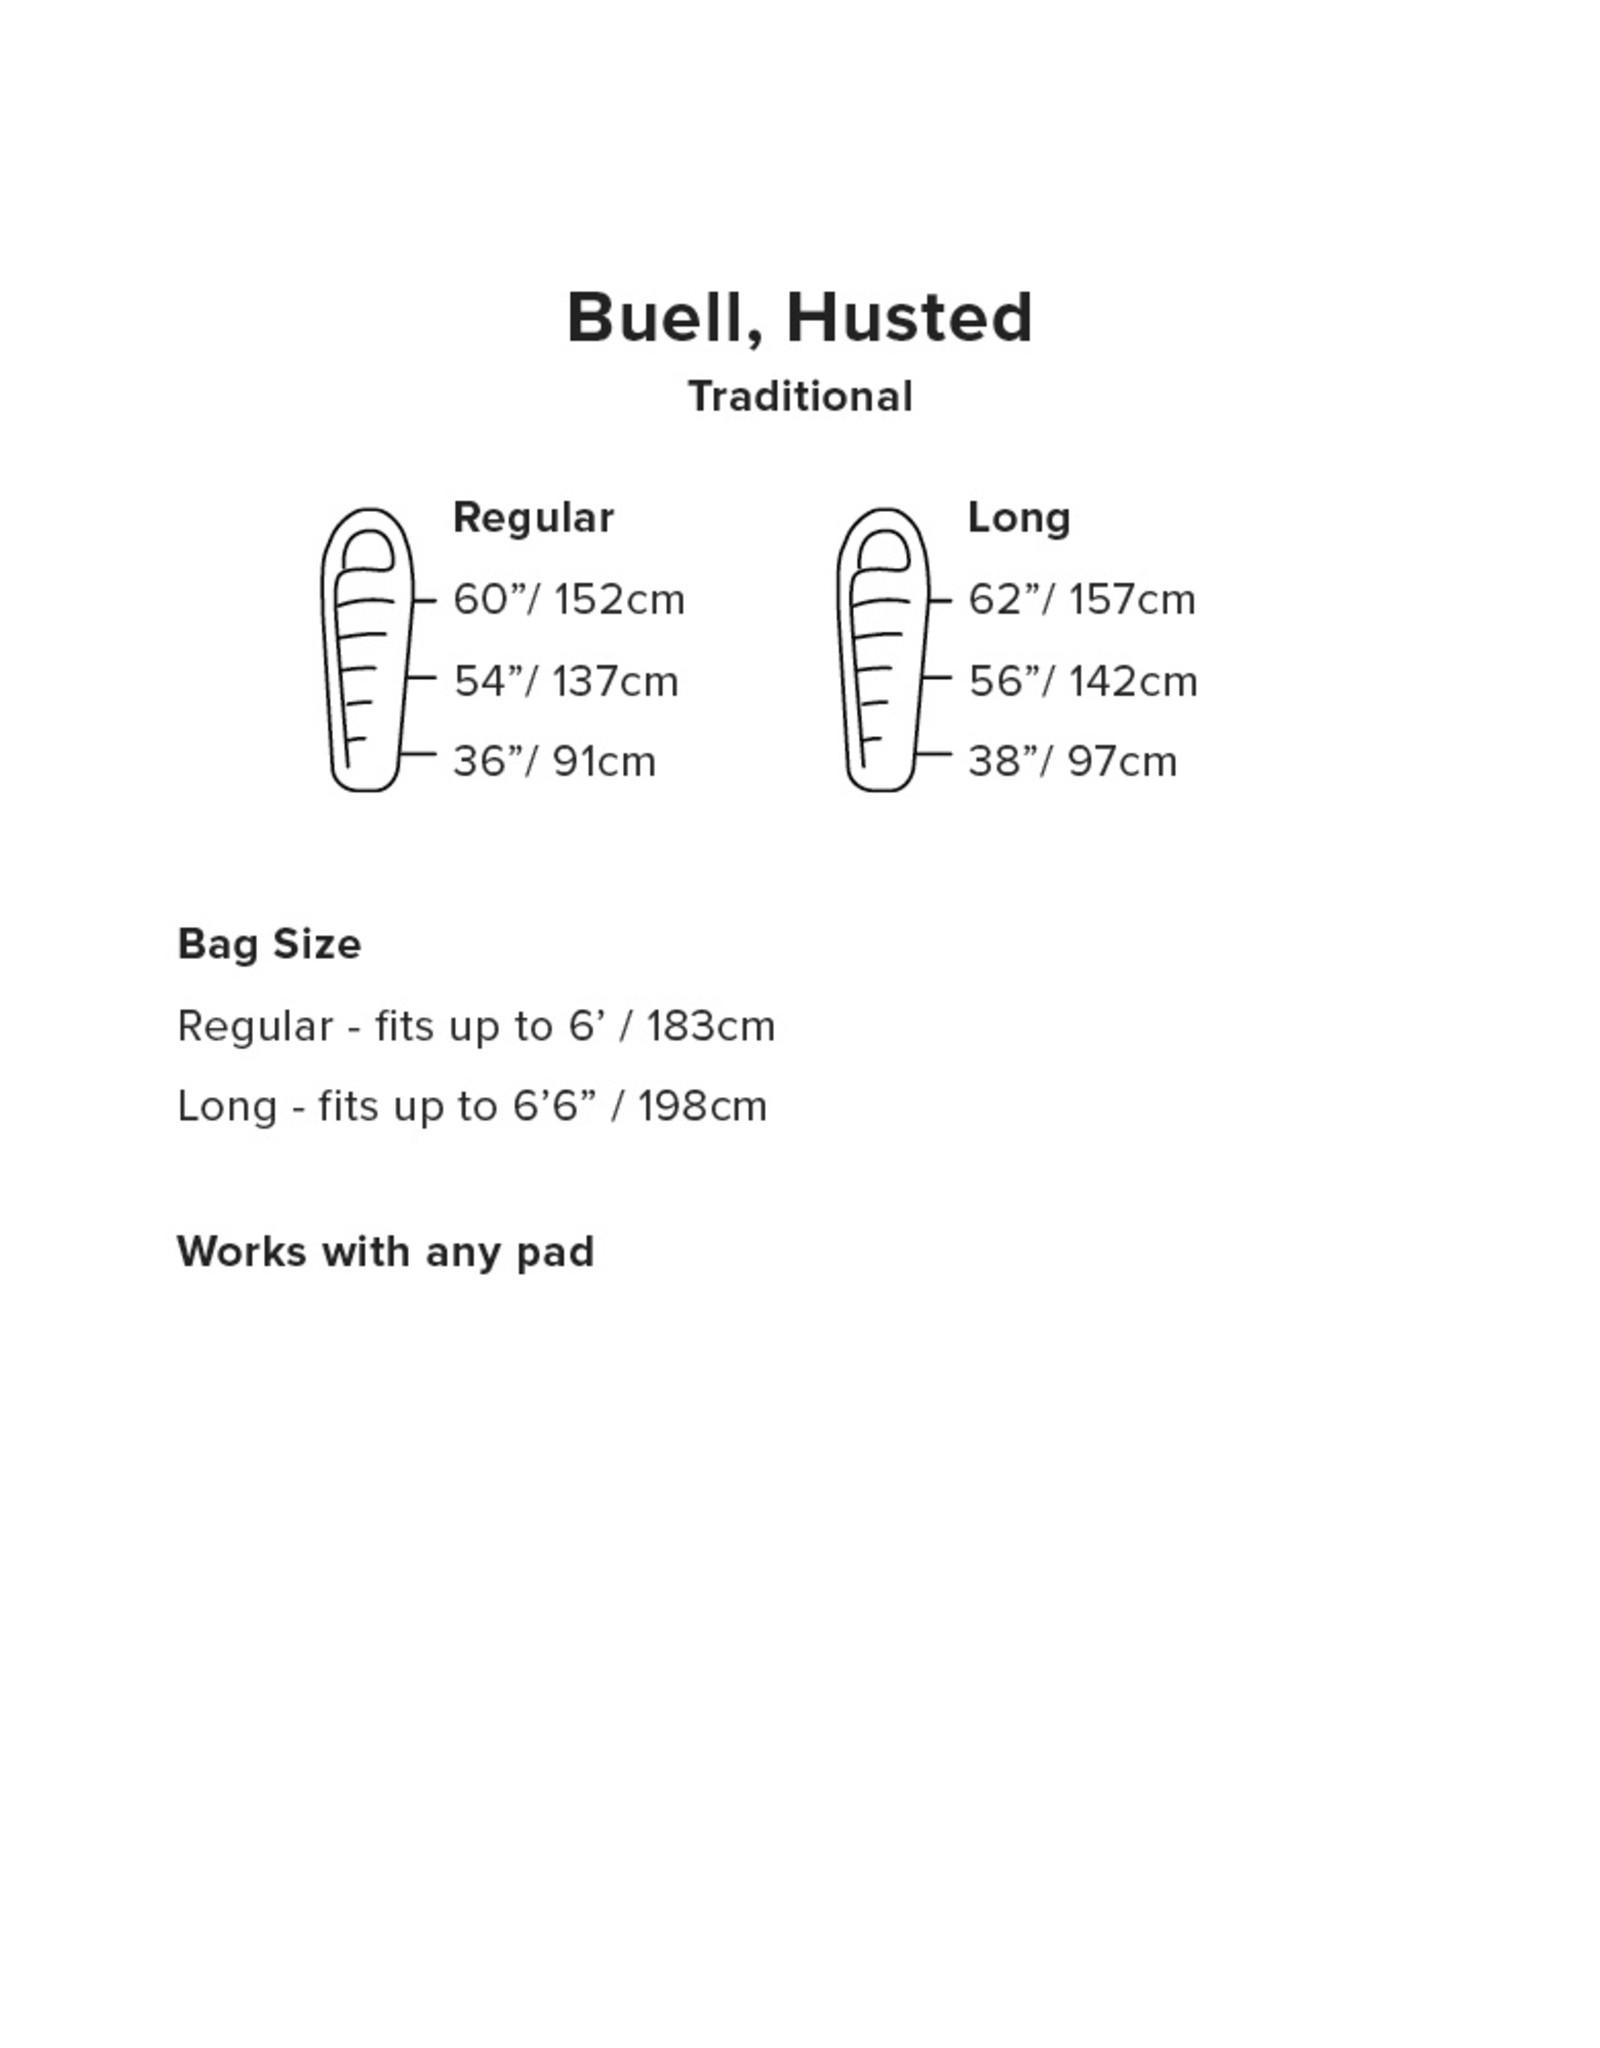 Big Agnes Buell 30 (FireLine Pro) REGULAR LEFT